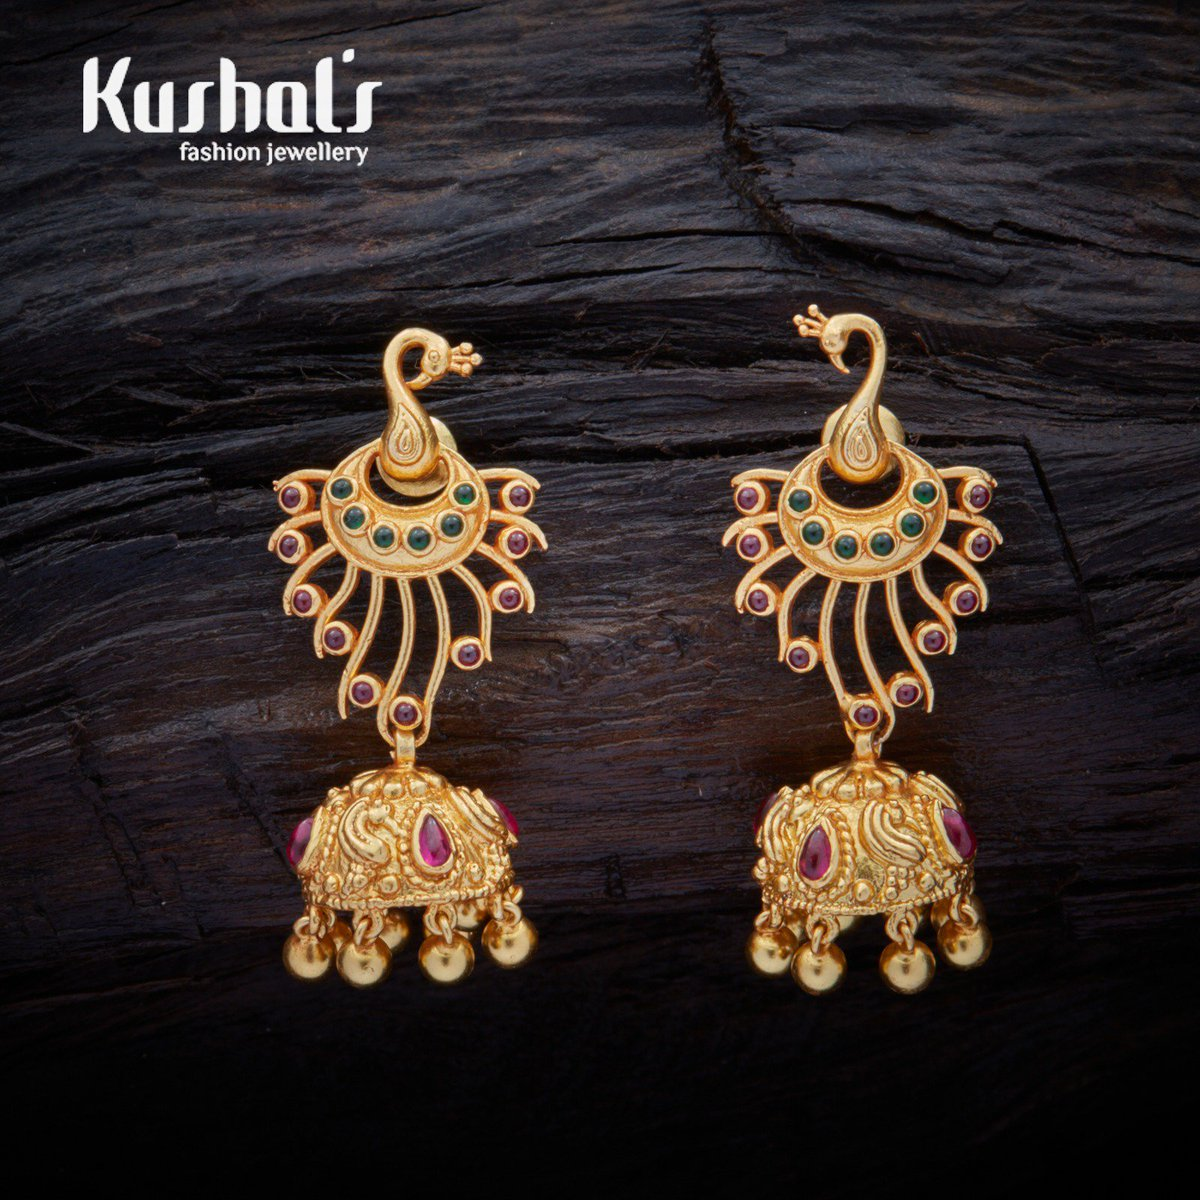 Kushal's Jewellery on Twitter: